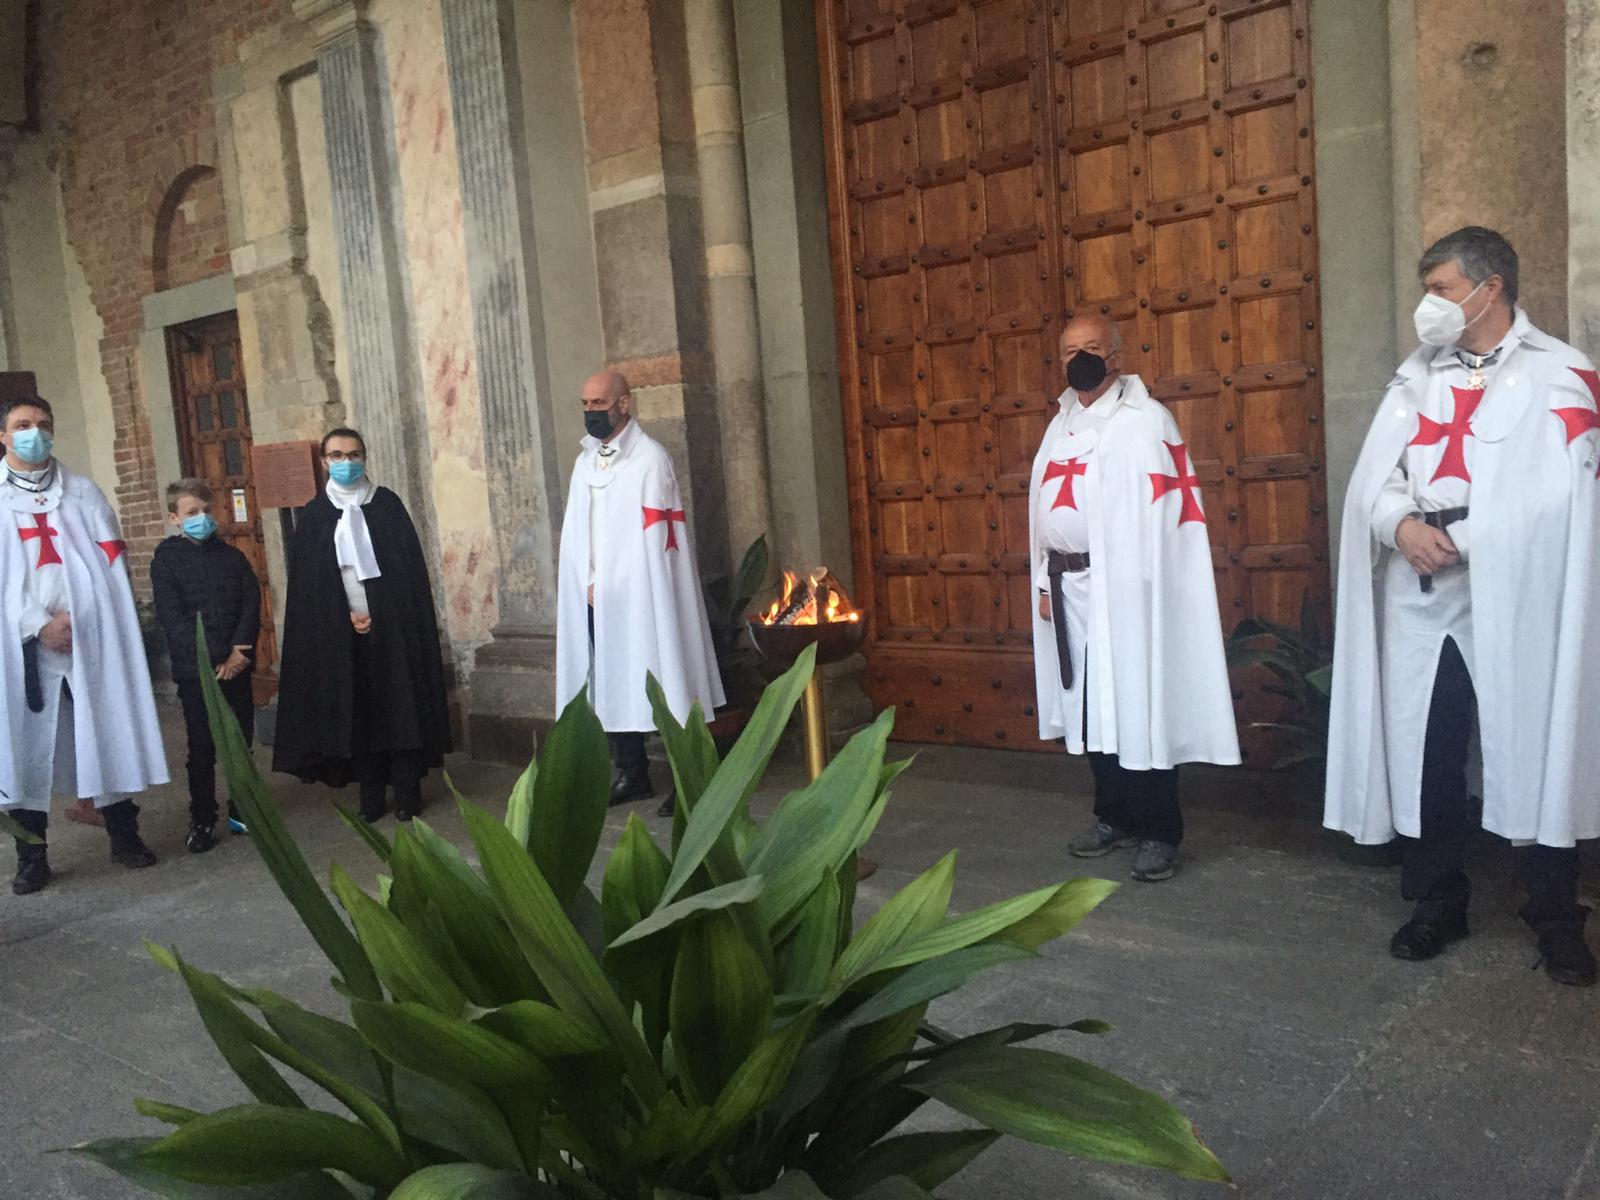 Turno di custodia chiesa di San Savino – Piacenza 03.04.2021